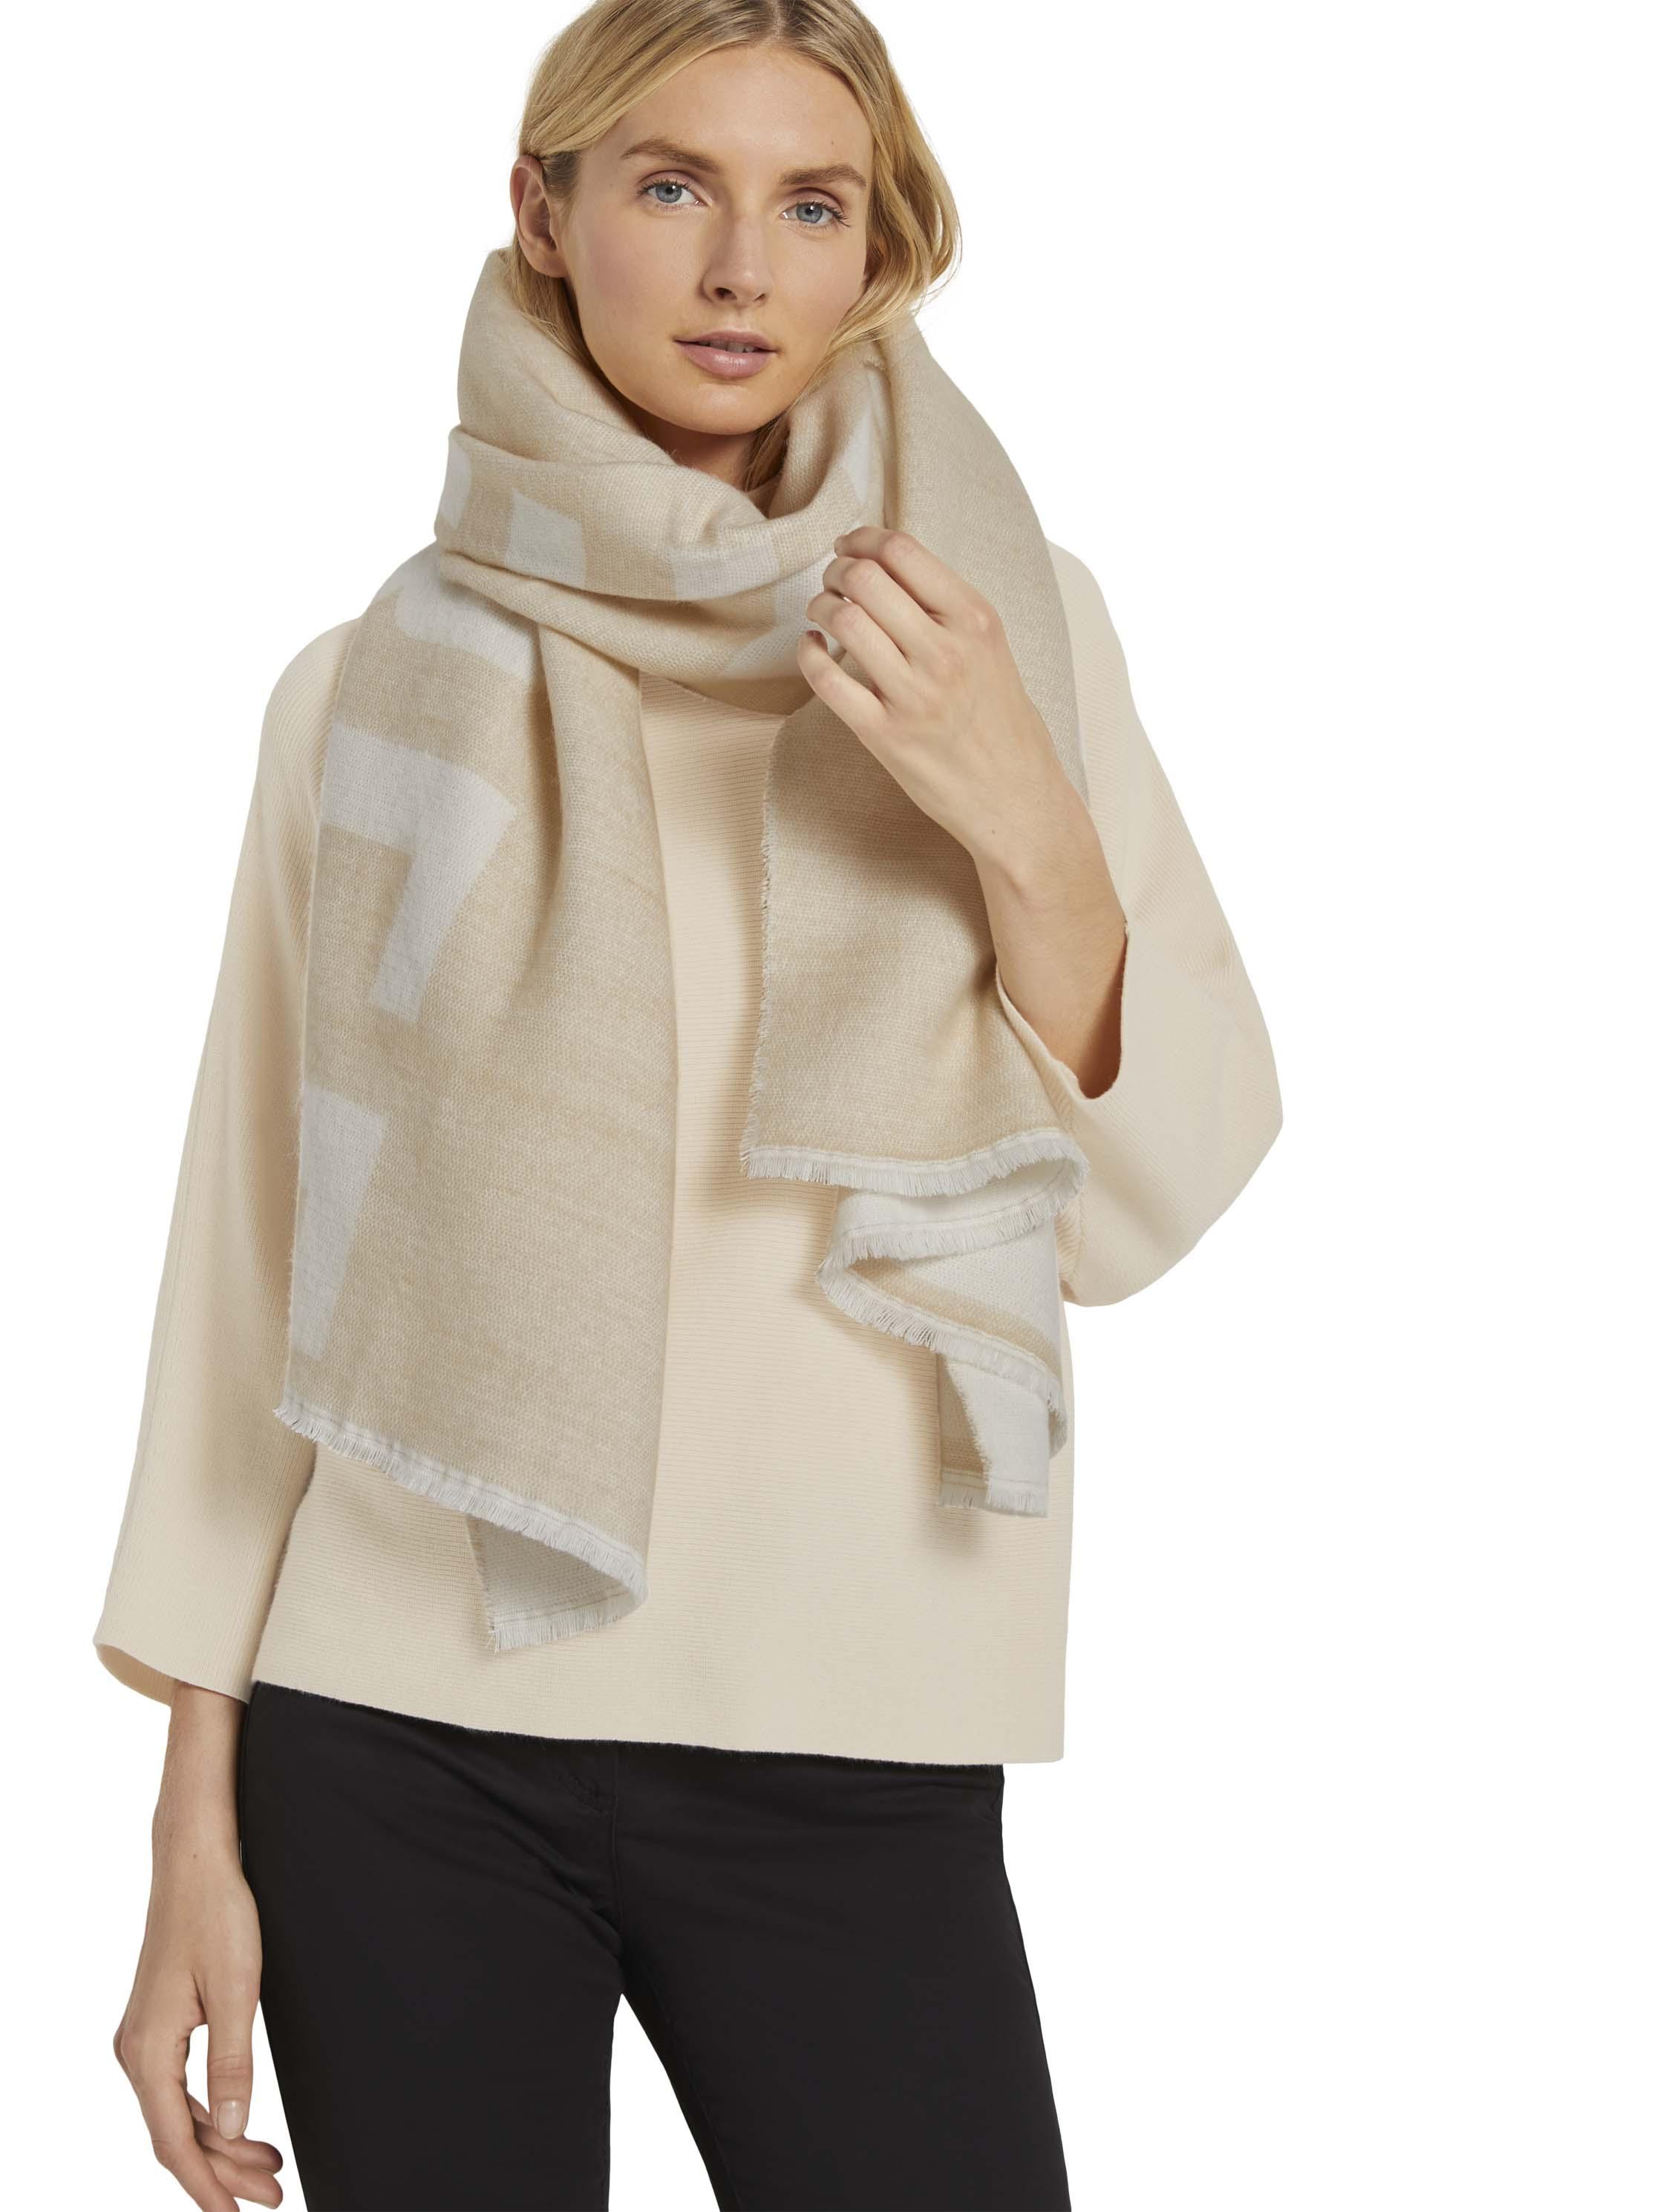 cozy scarf with wording, Cargo Beige